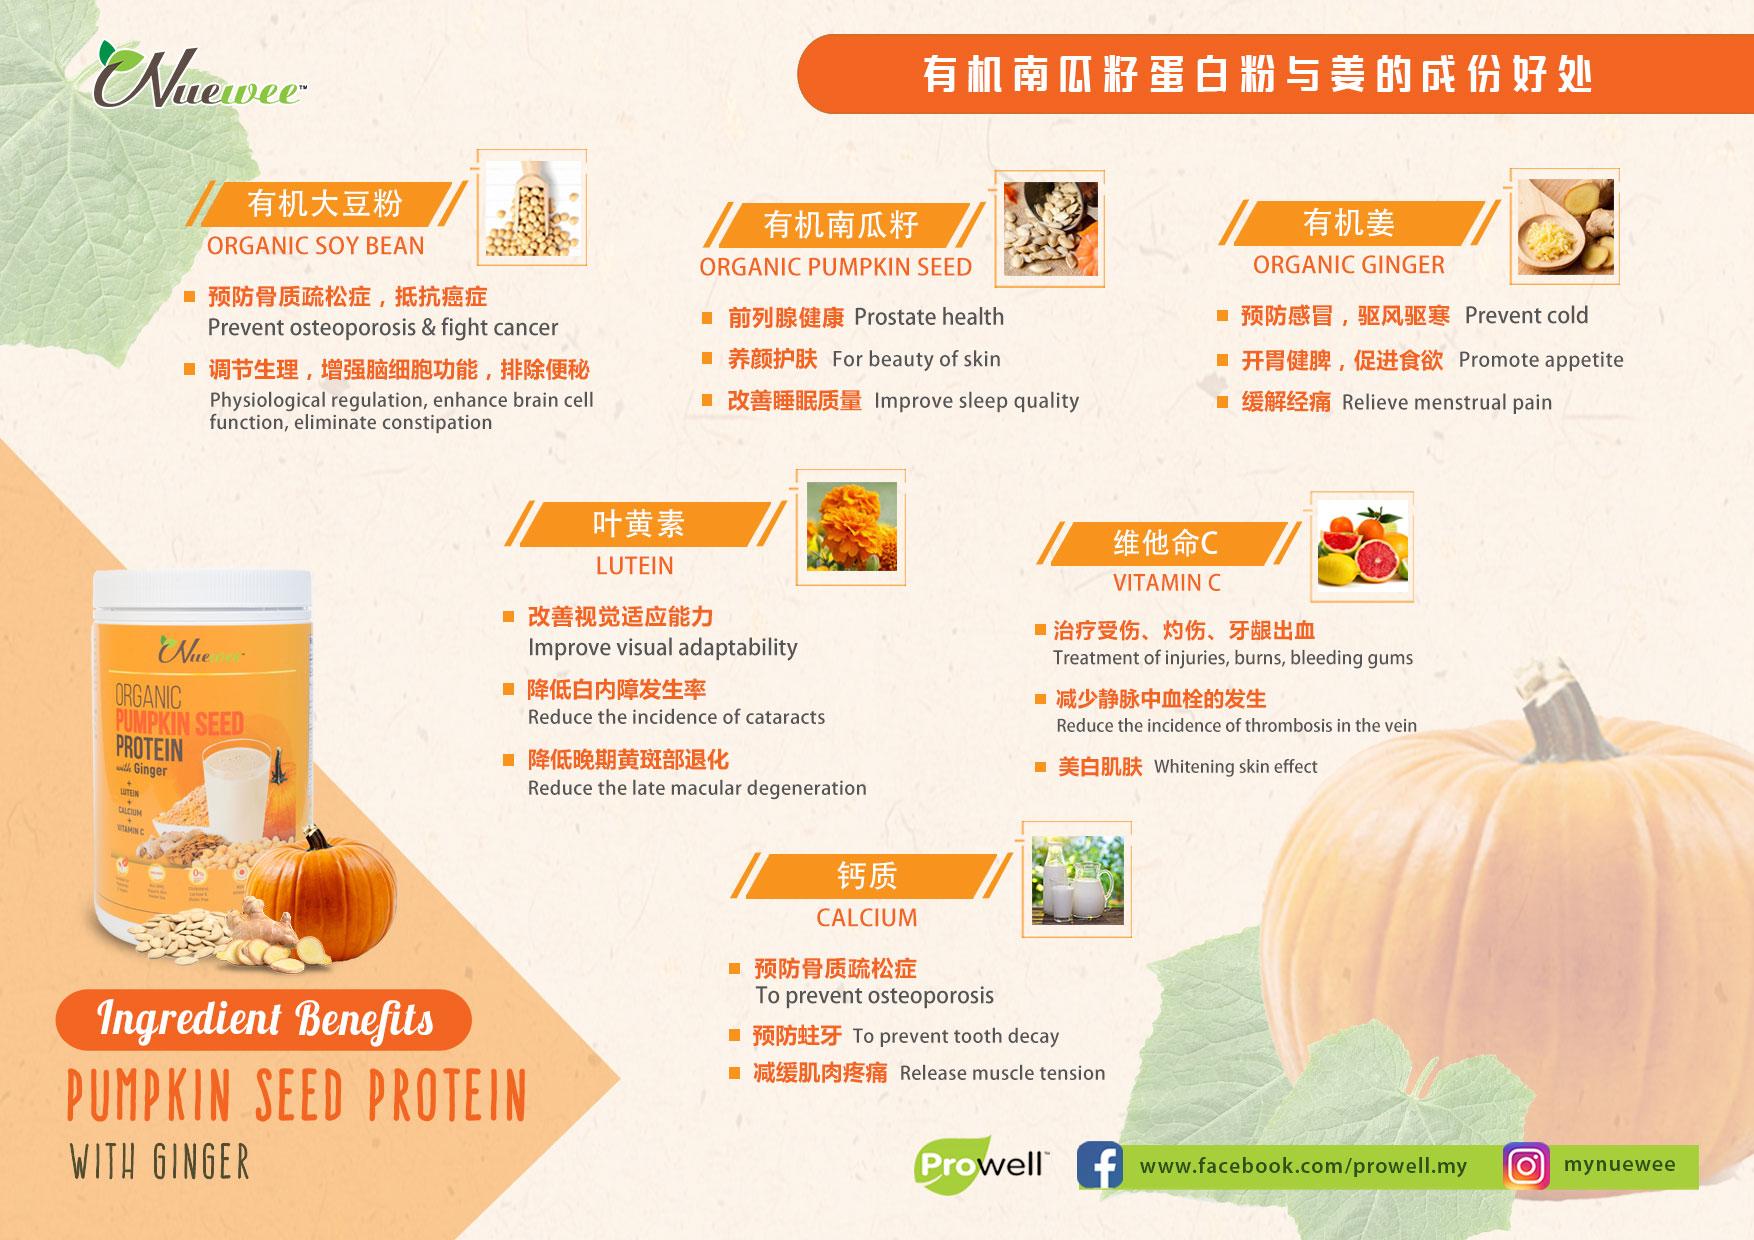 Ingredients of Nuewee Organic Pumpkin Seeds Protein with Ginger.jpg